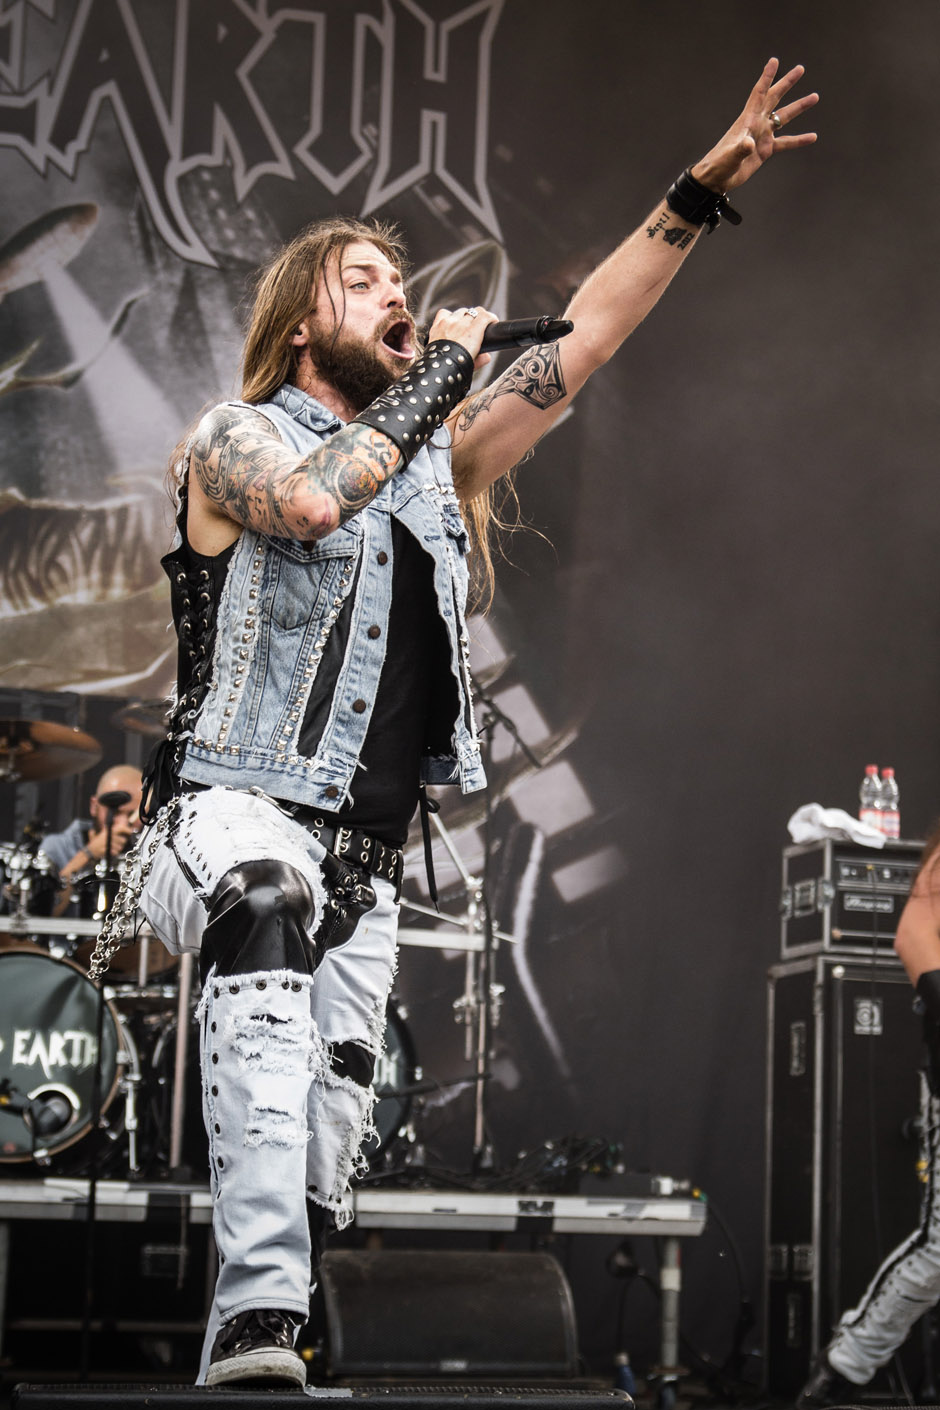 Iced Earth live, Metalfest Loreley 2013